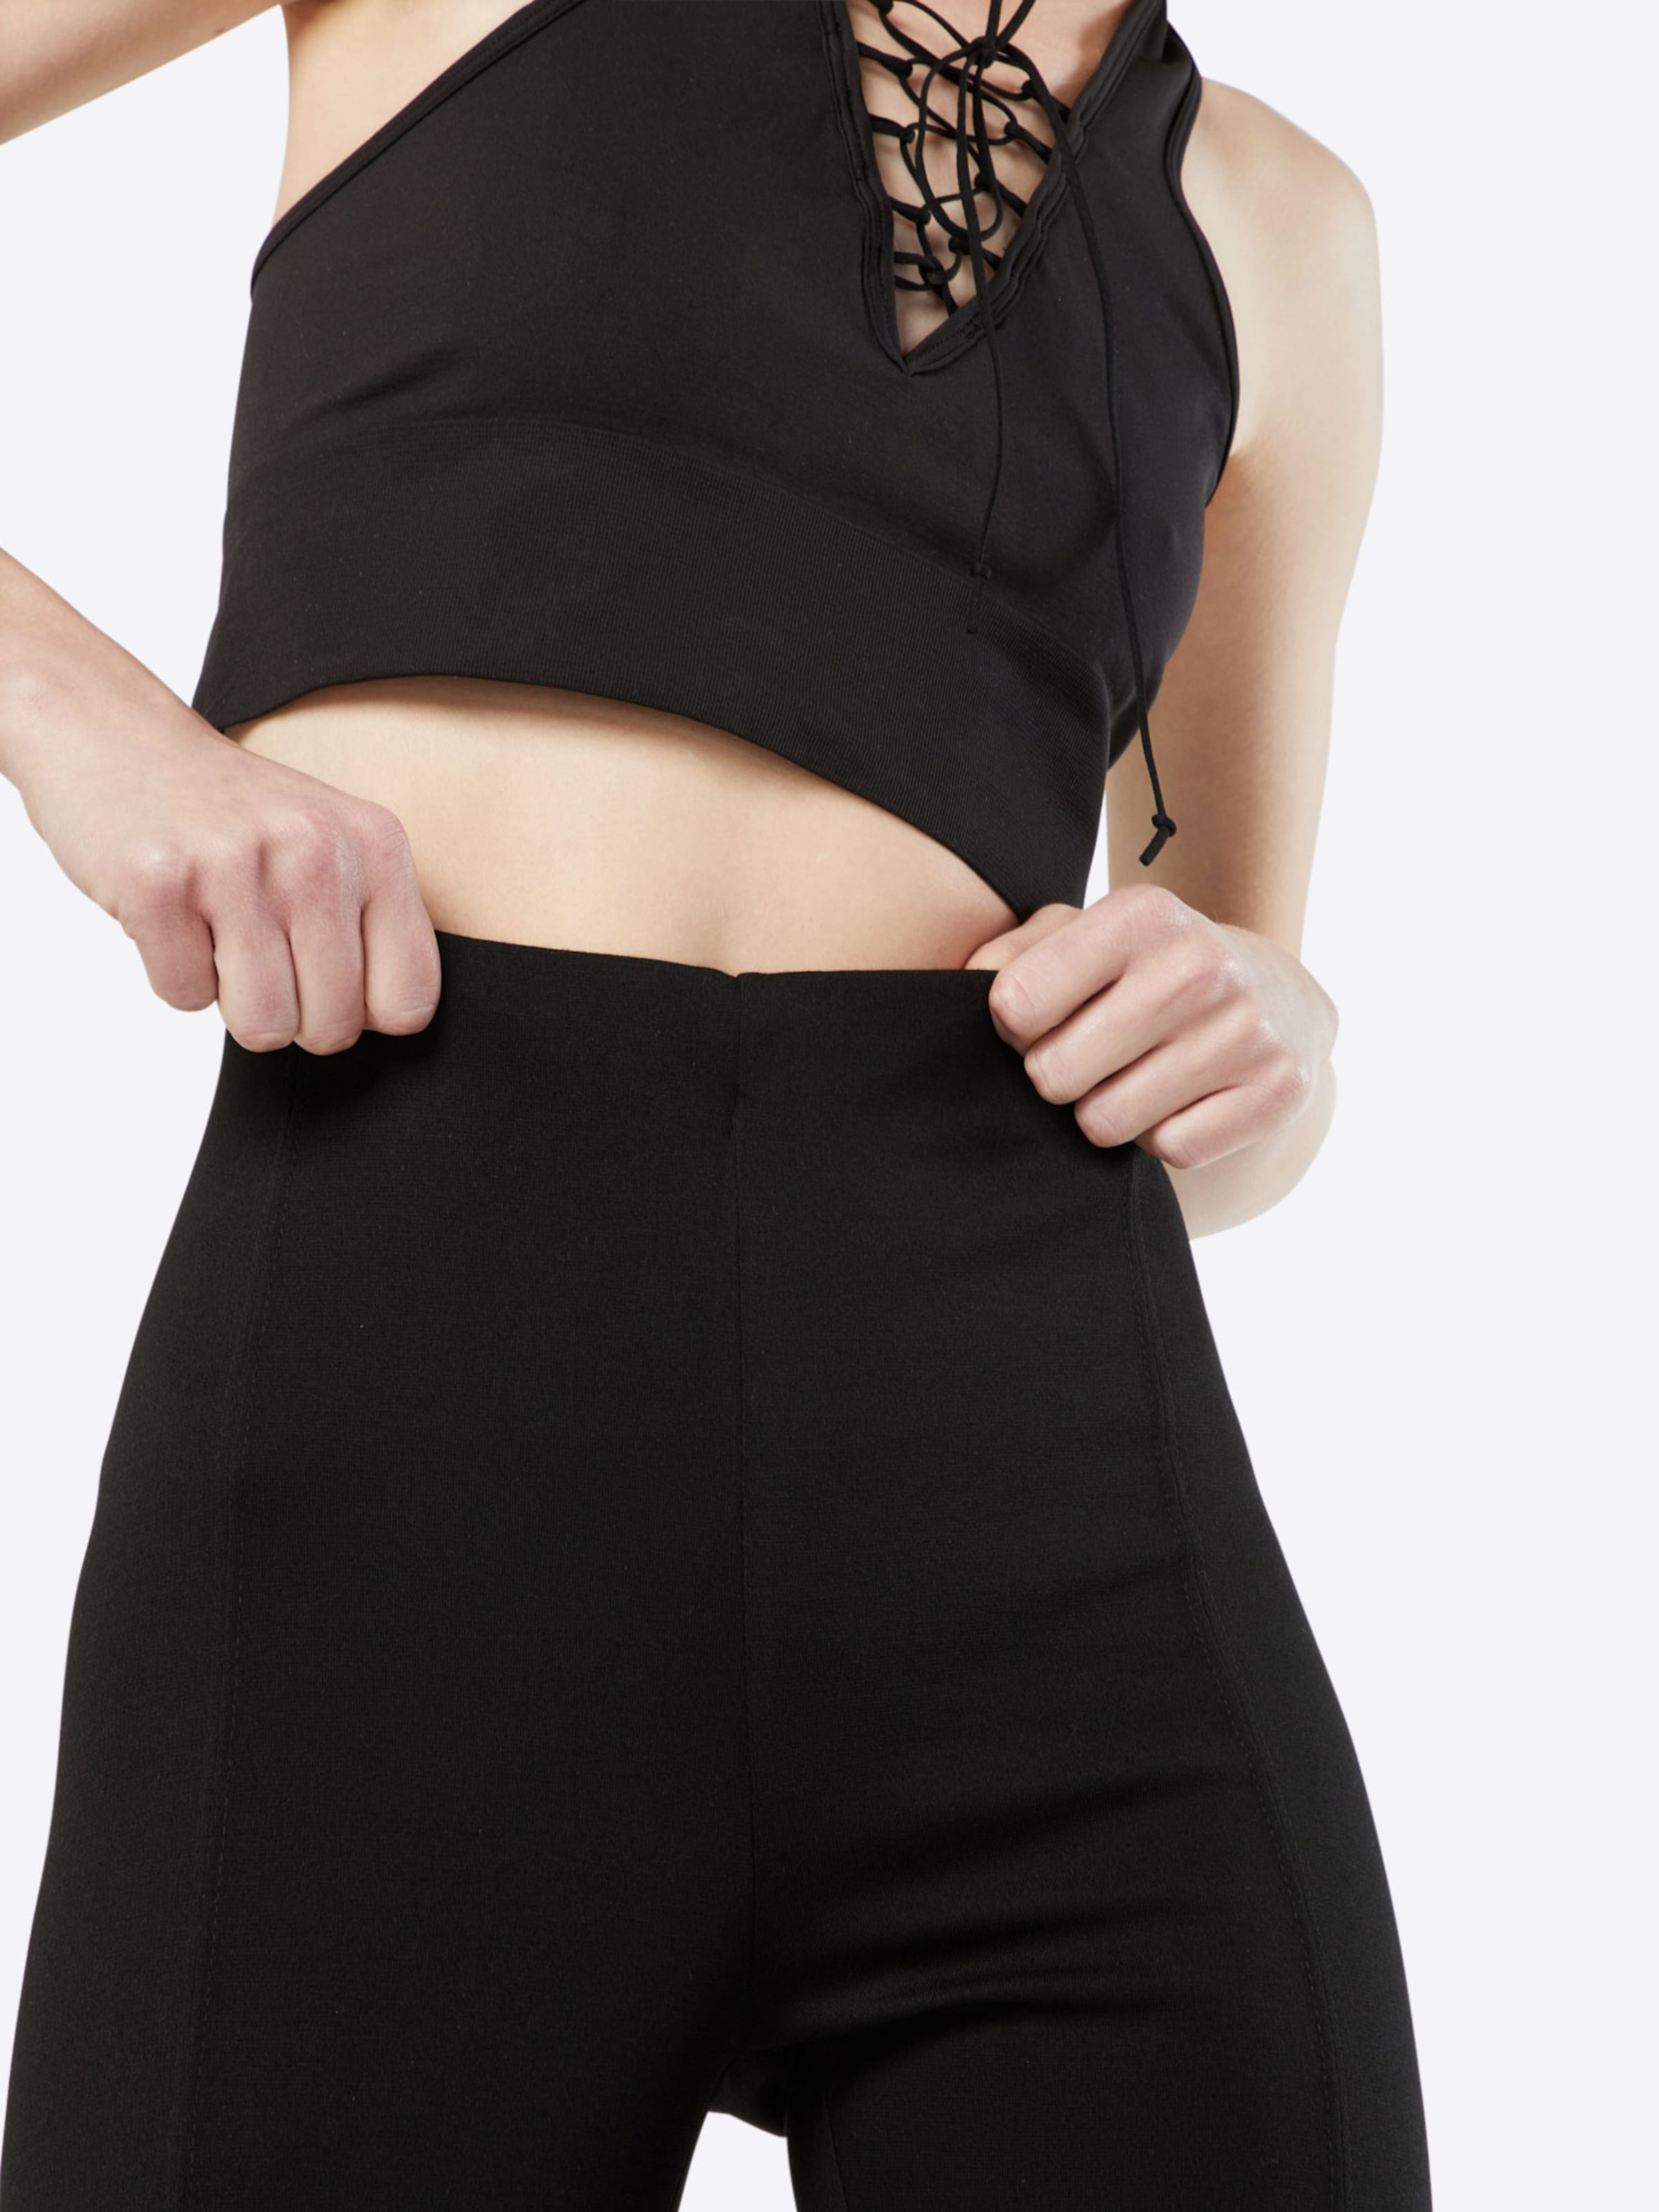 Outlet Neuesten Kollektionen Meistverkauft VILA Skinny Leggings 'VIFAUNAS' Preiswerte Reale Eastbay Outlet-Store vTa4dT8AQ